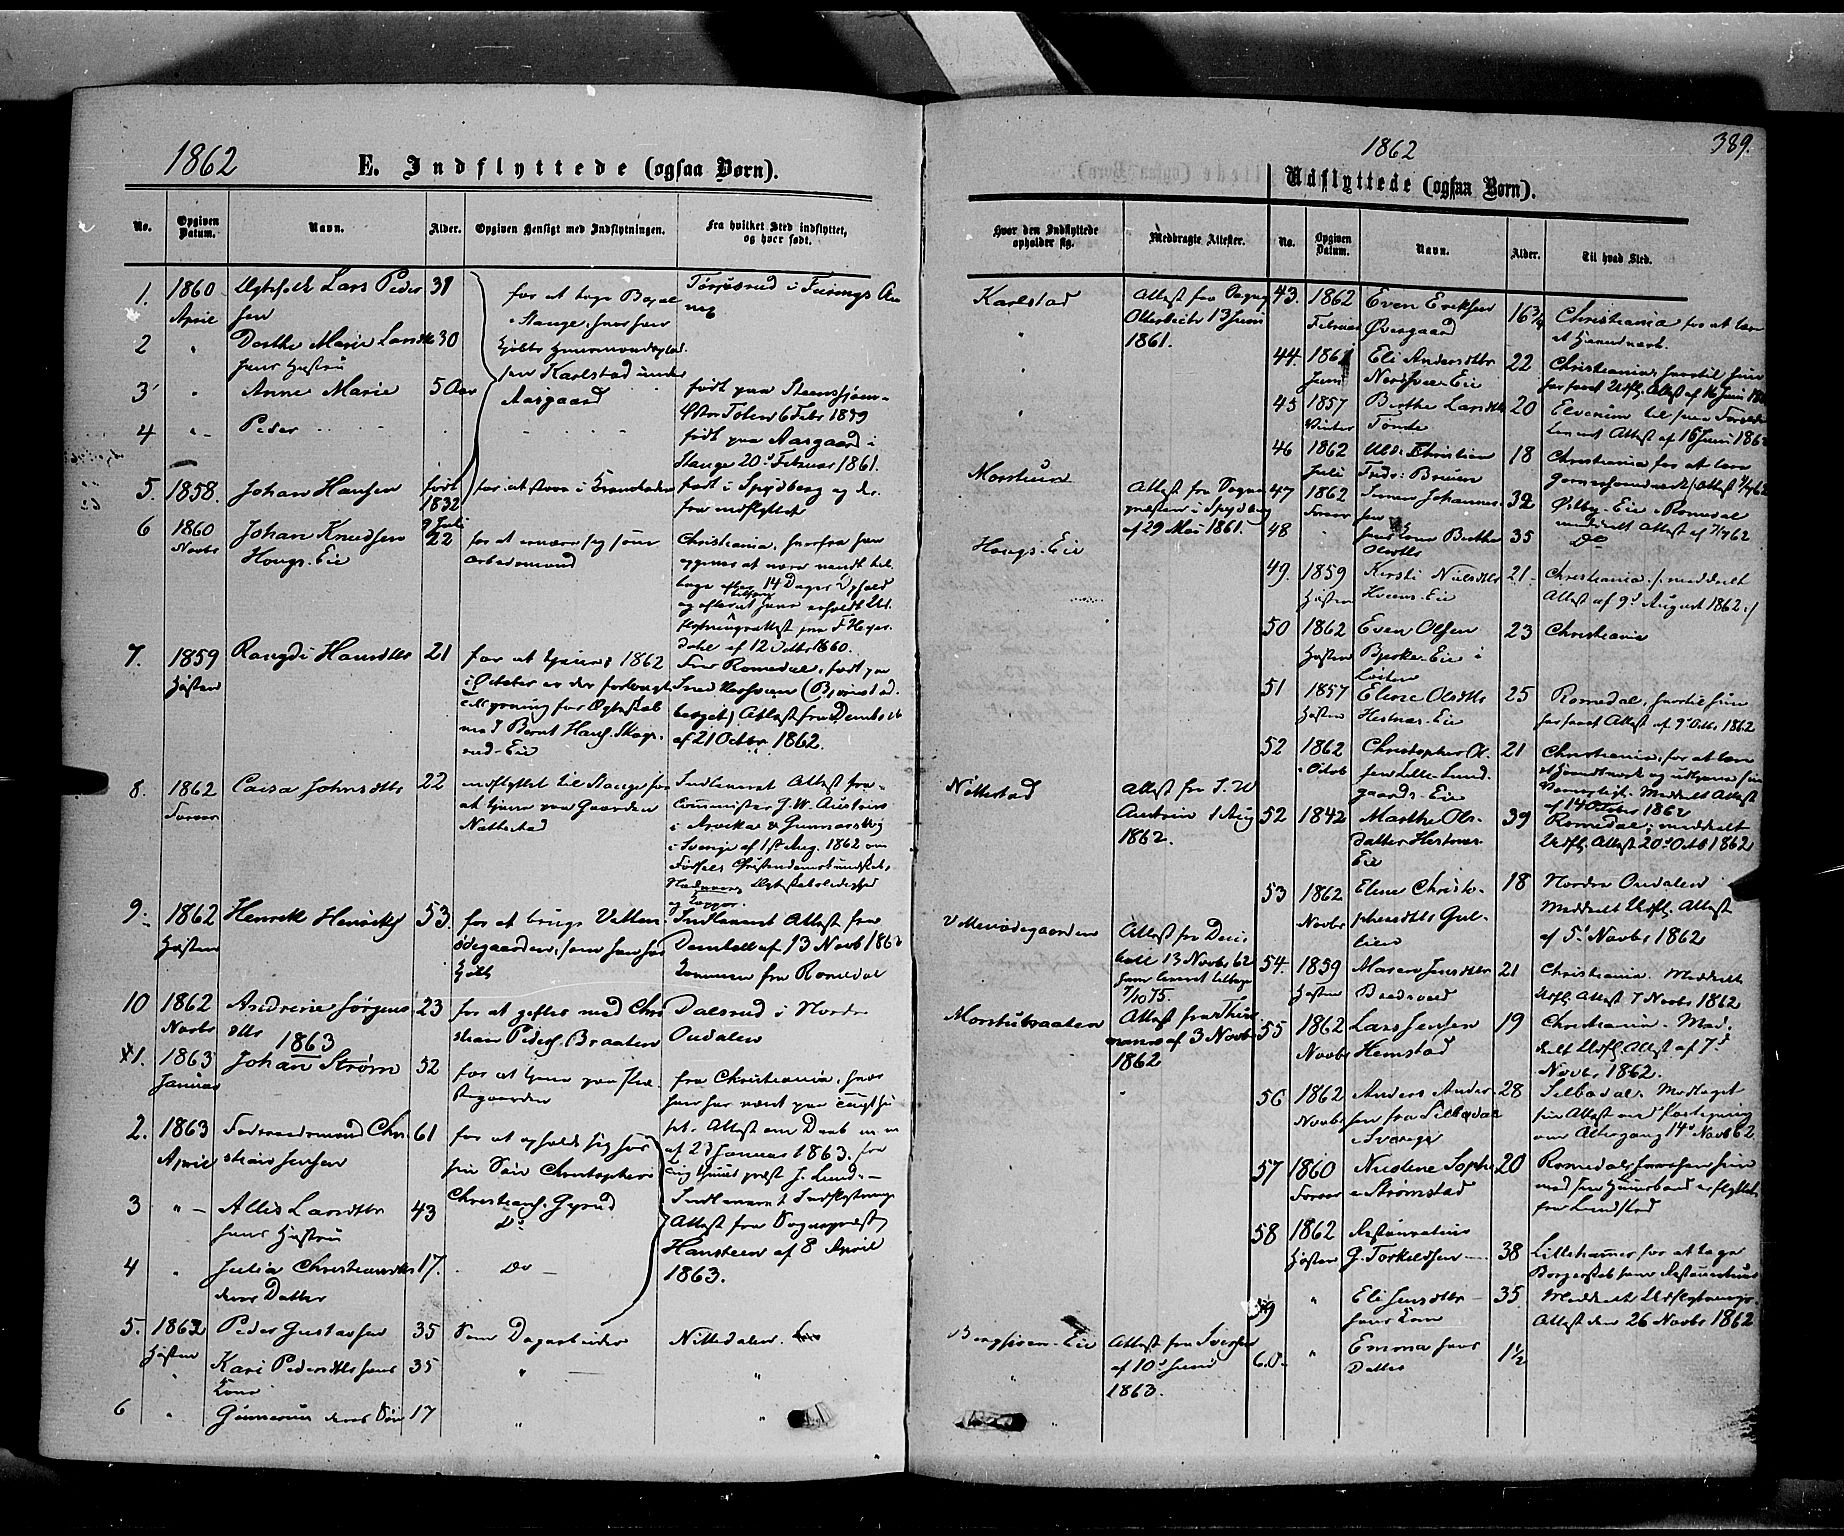 SAH, Stange prestekontor, K/L0013: Ministerialbok nr. 13, 1862-1879, s. 389